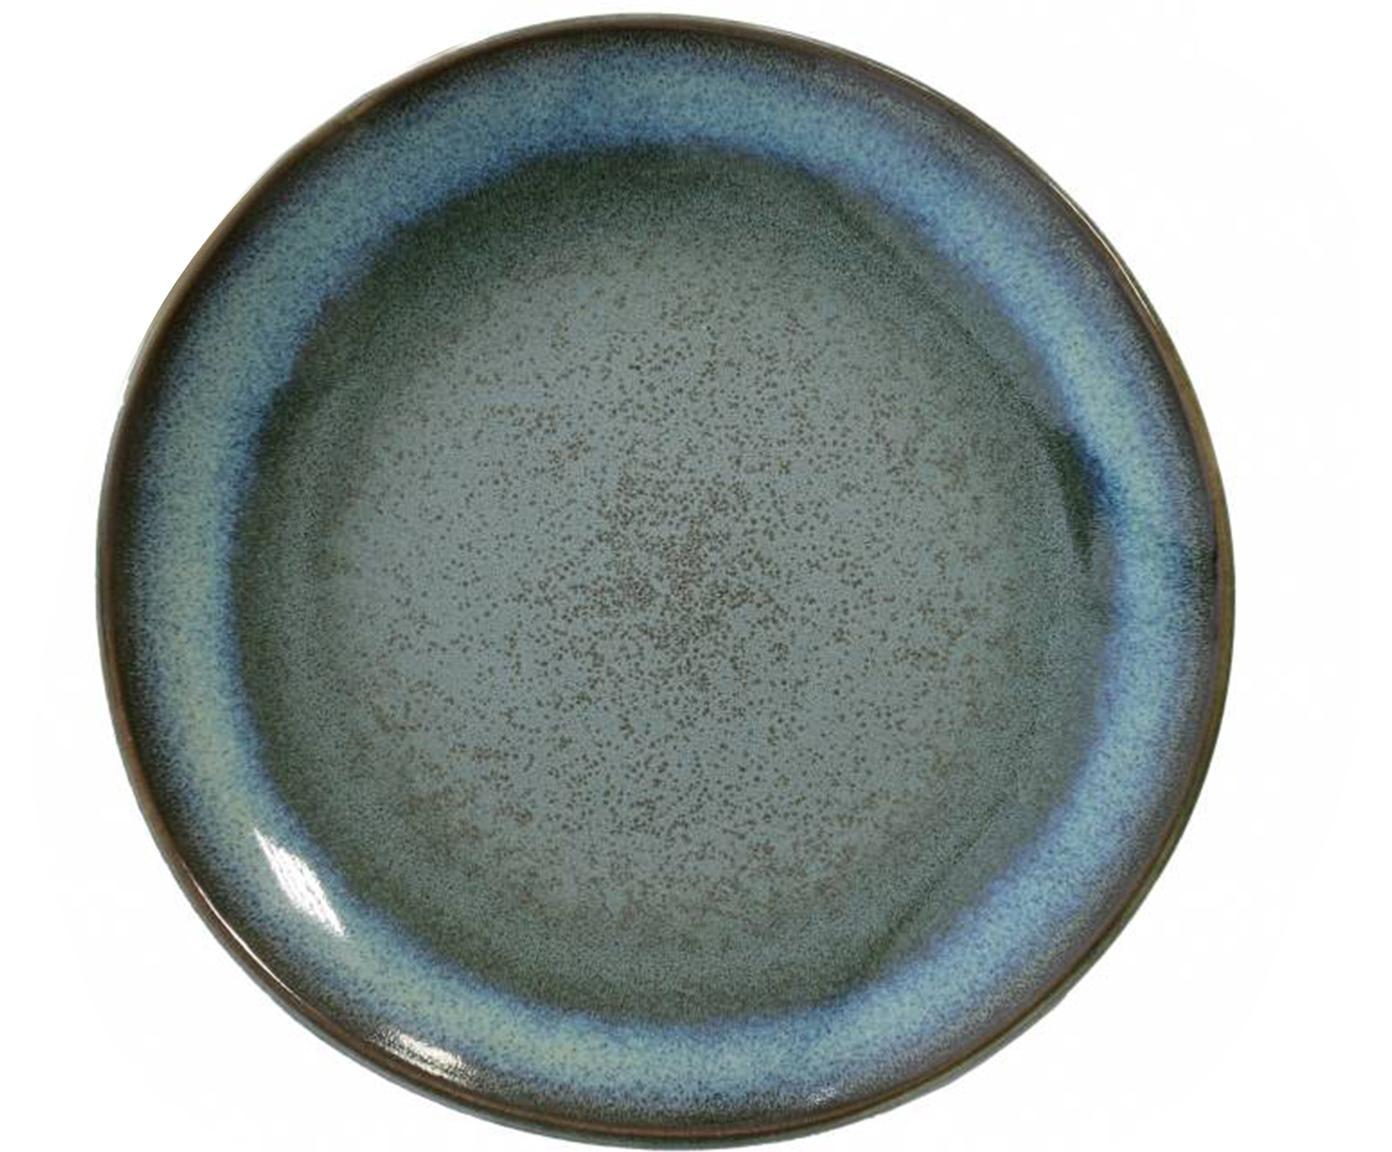 Handgemachte Kuchenteller 70's, 2 Stück, Keramik, Blautöne, Grüntöne, Ø 18 cm